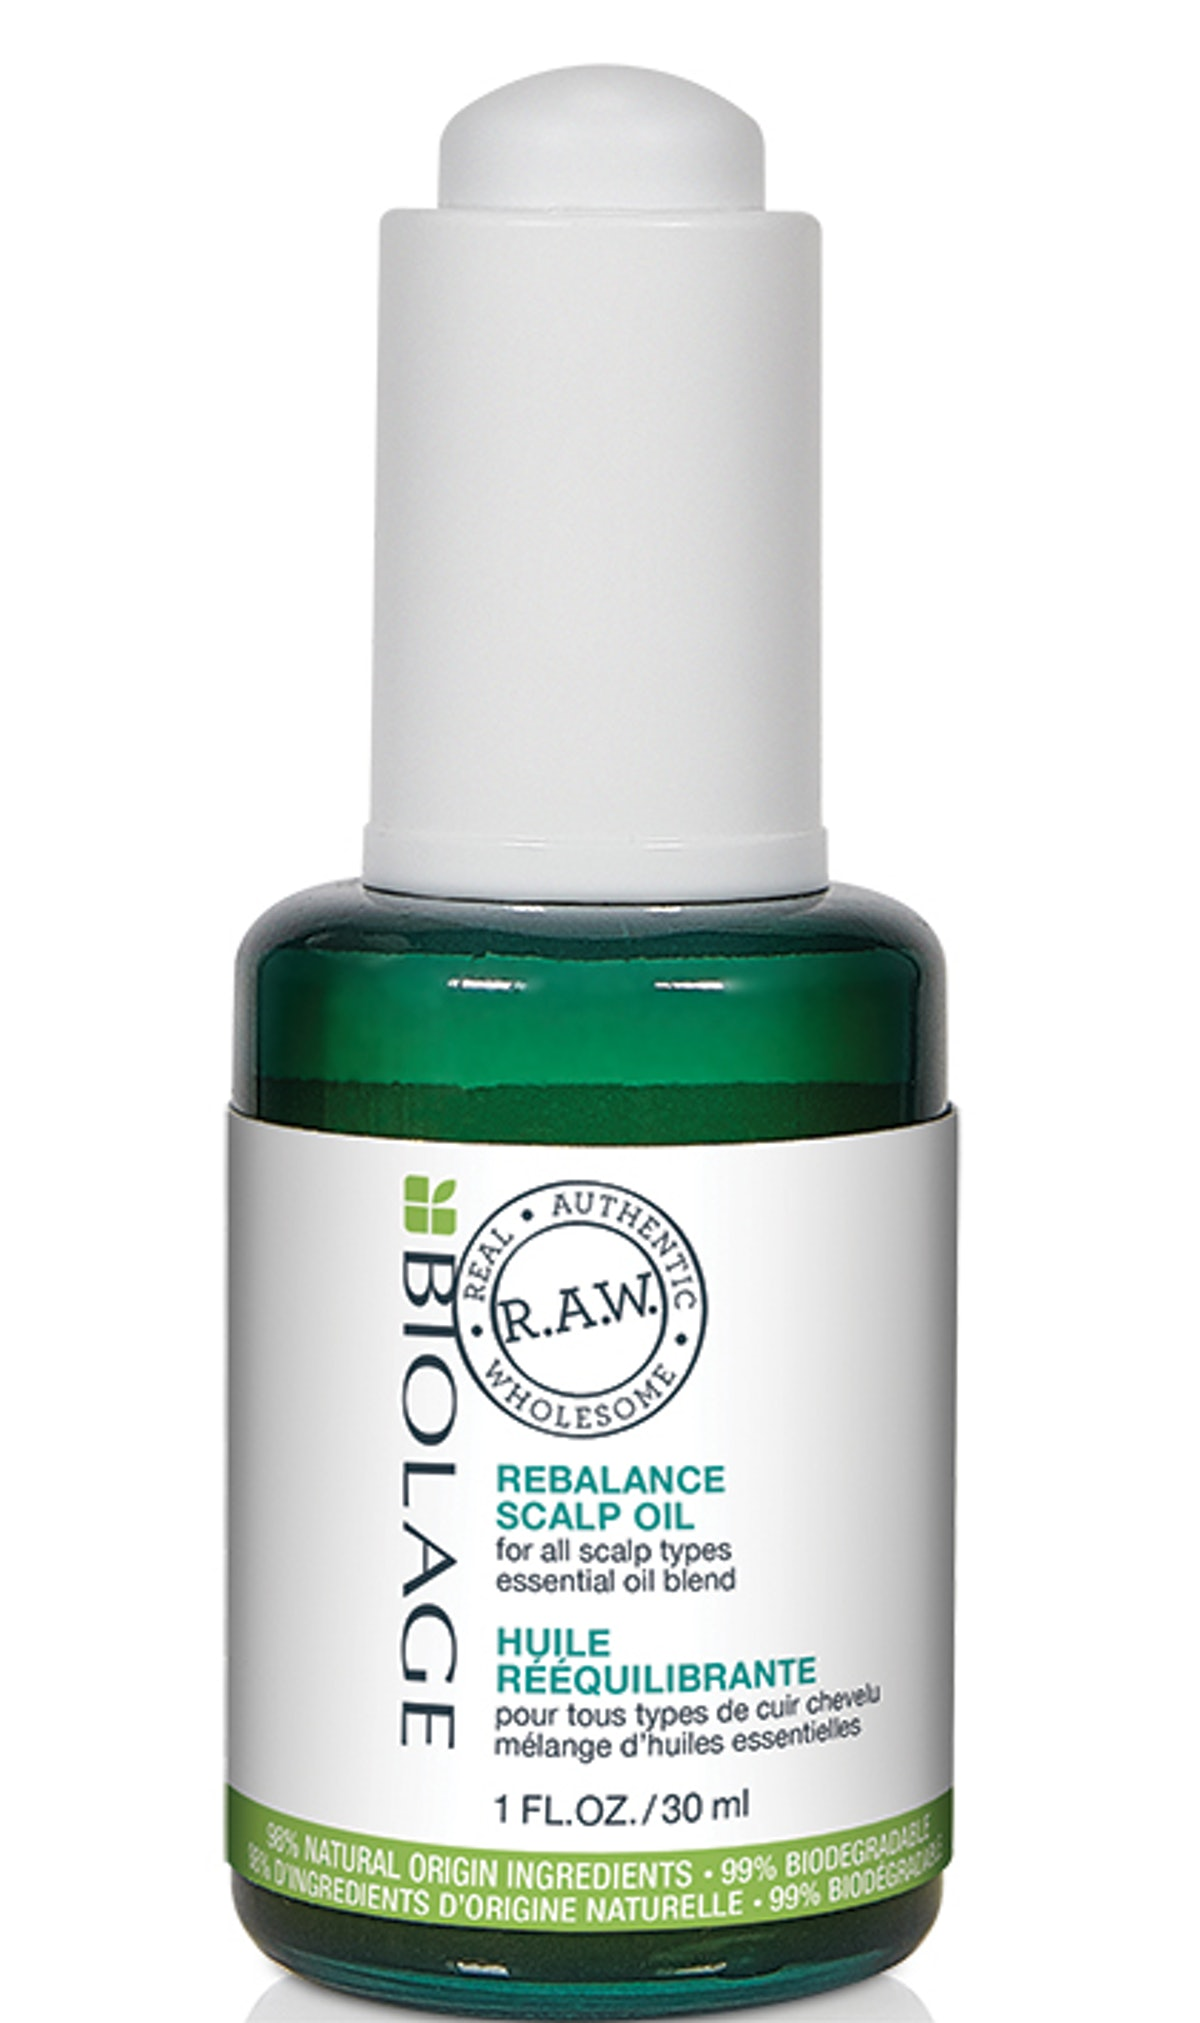 Biolage R.A.W. Scalp Care Rebalance Scalp Oil